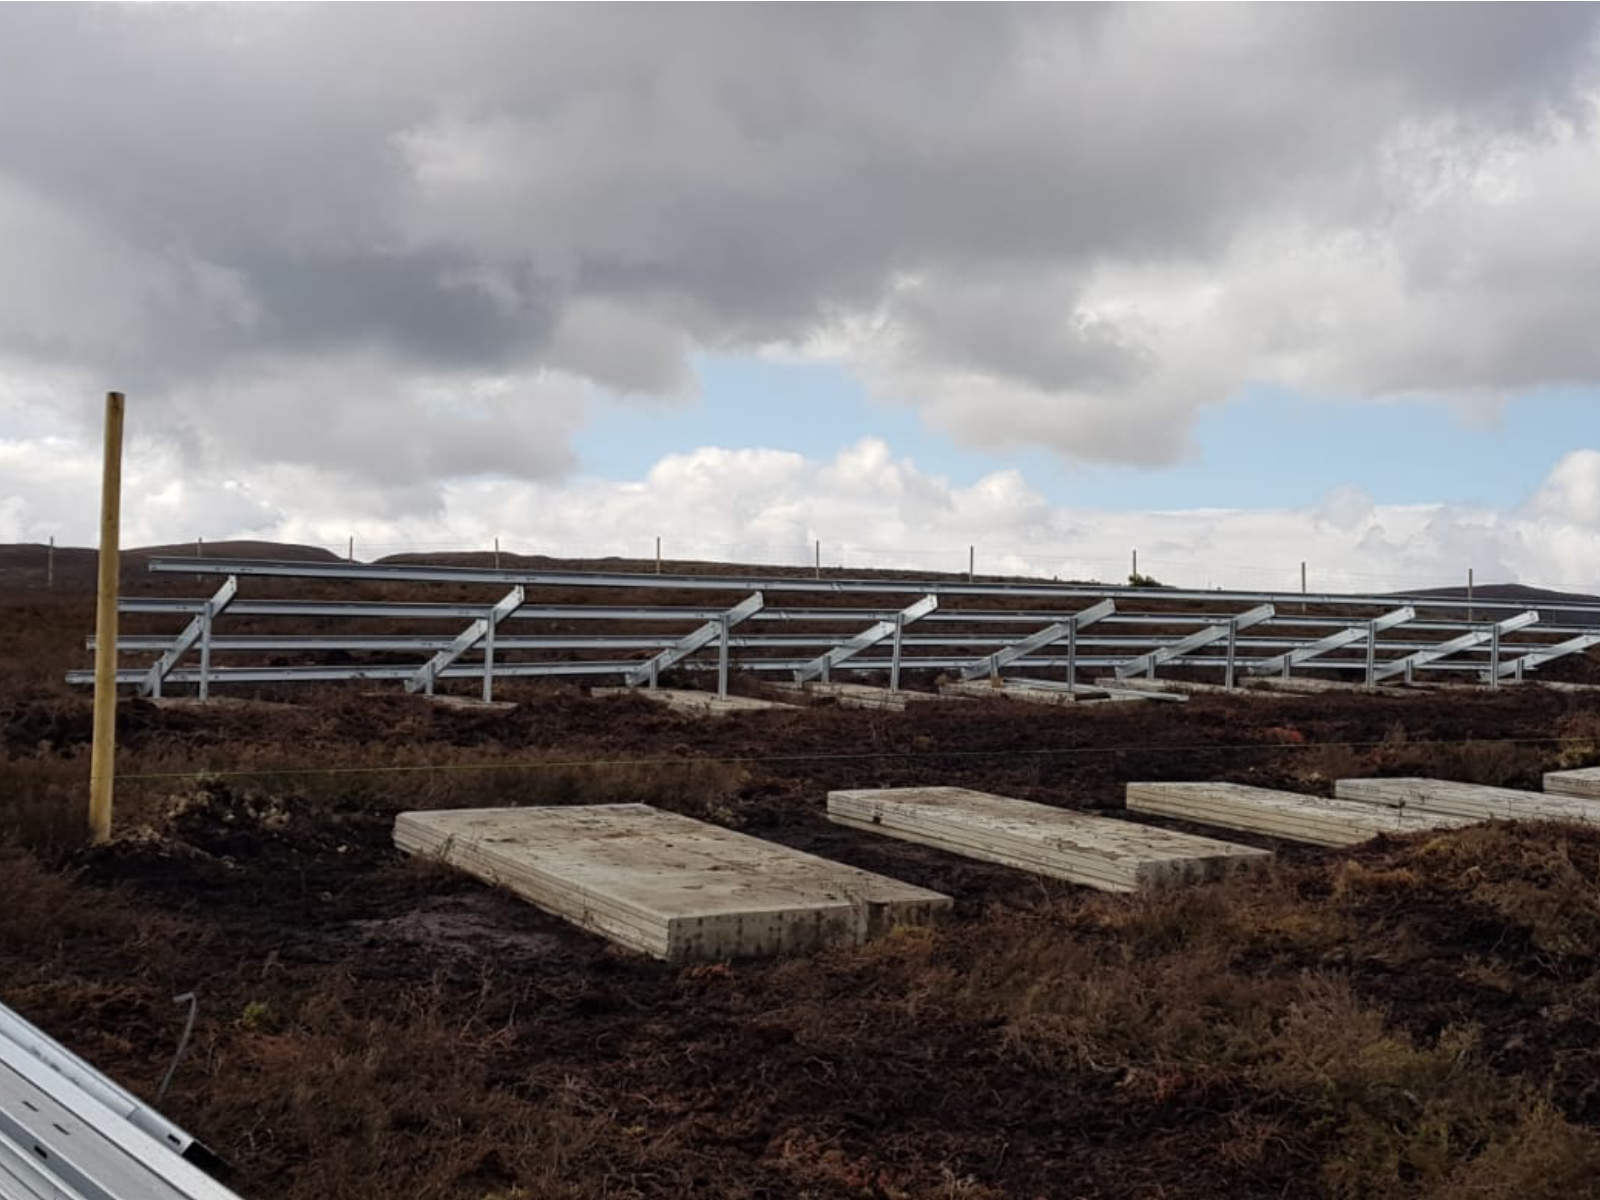 Estructuras fotovoltaicas